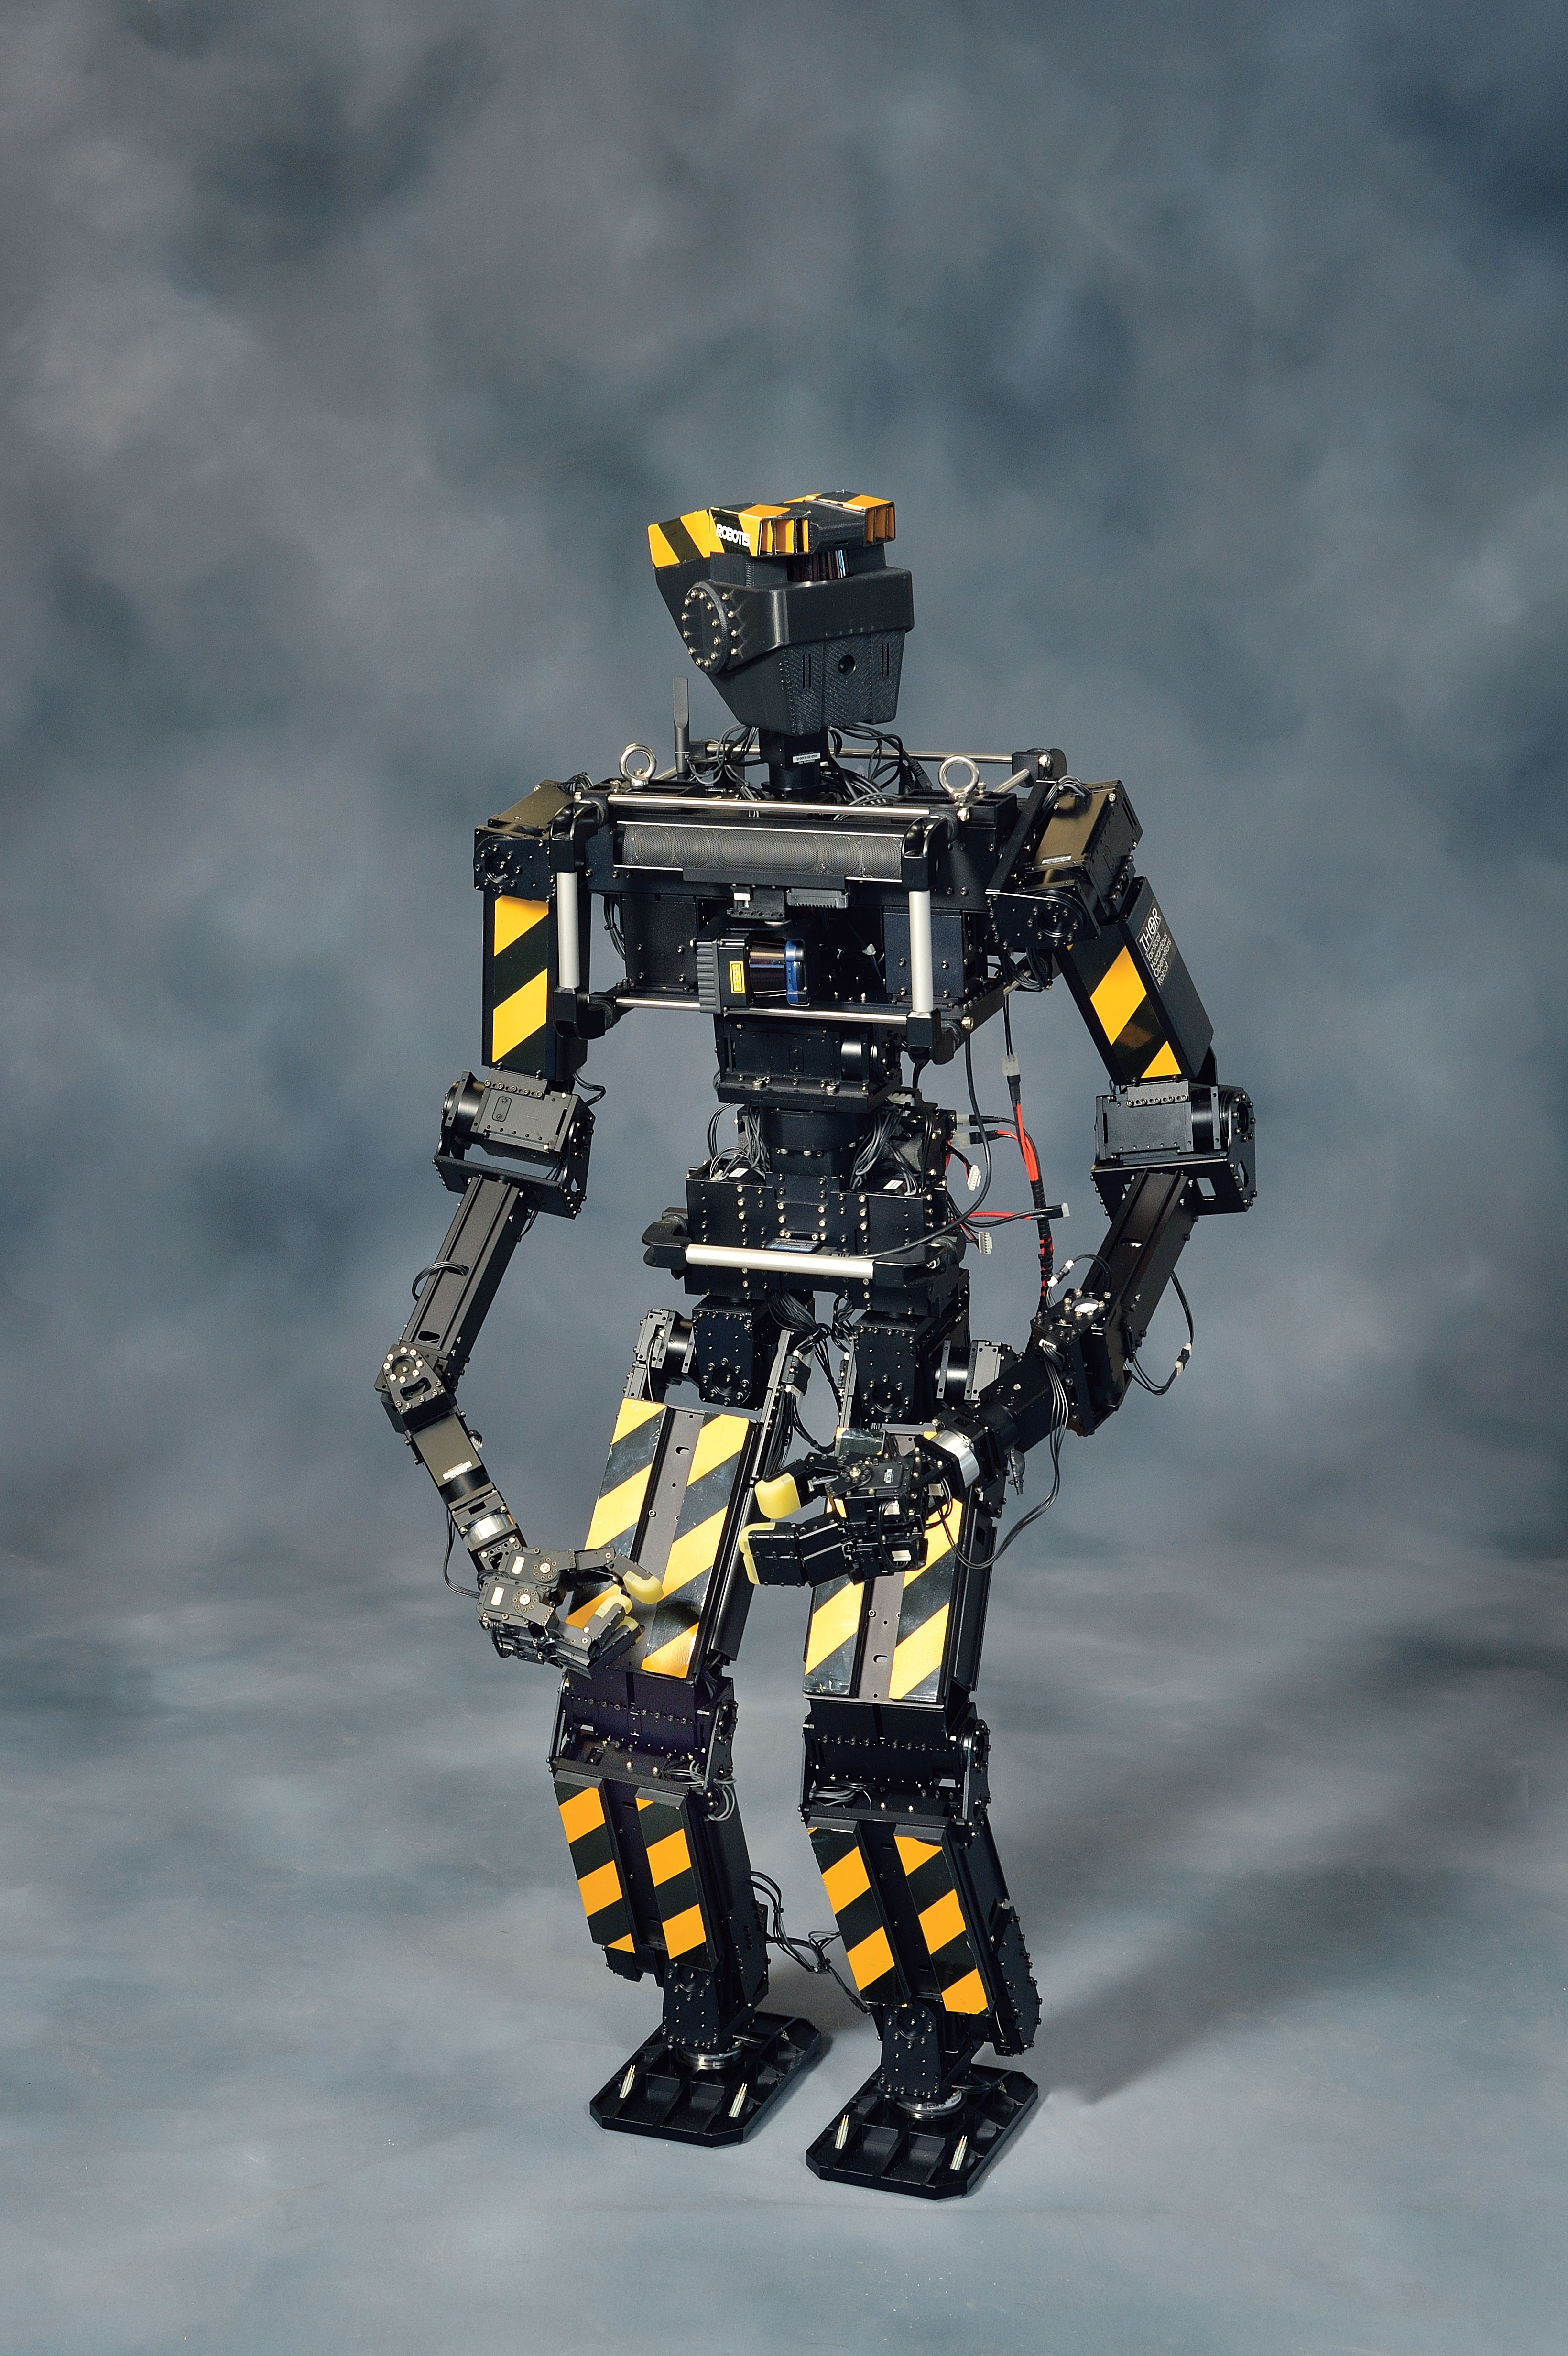 THOR-OP robot